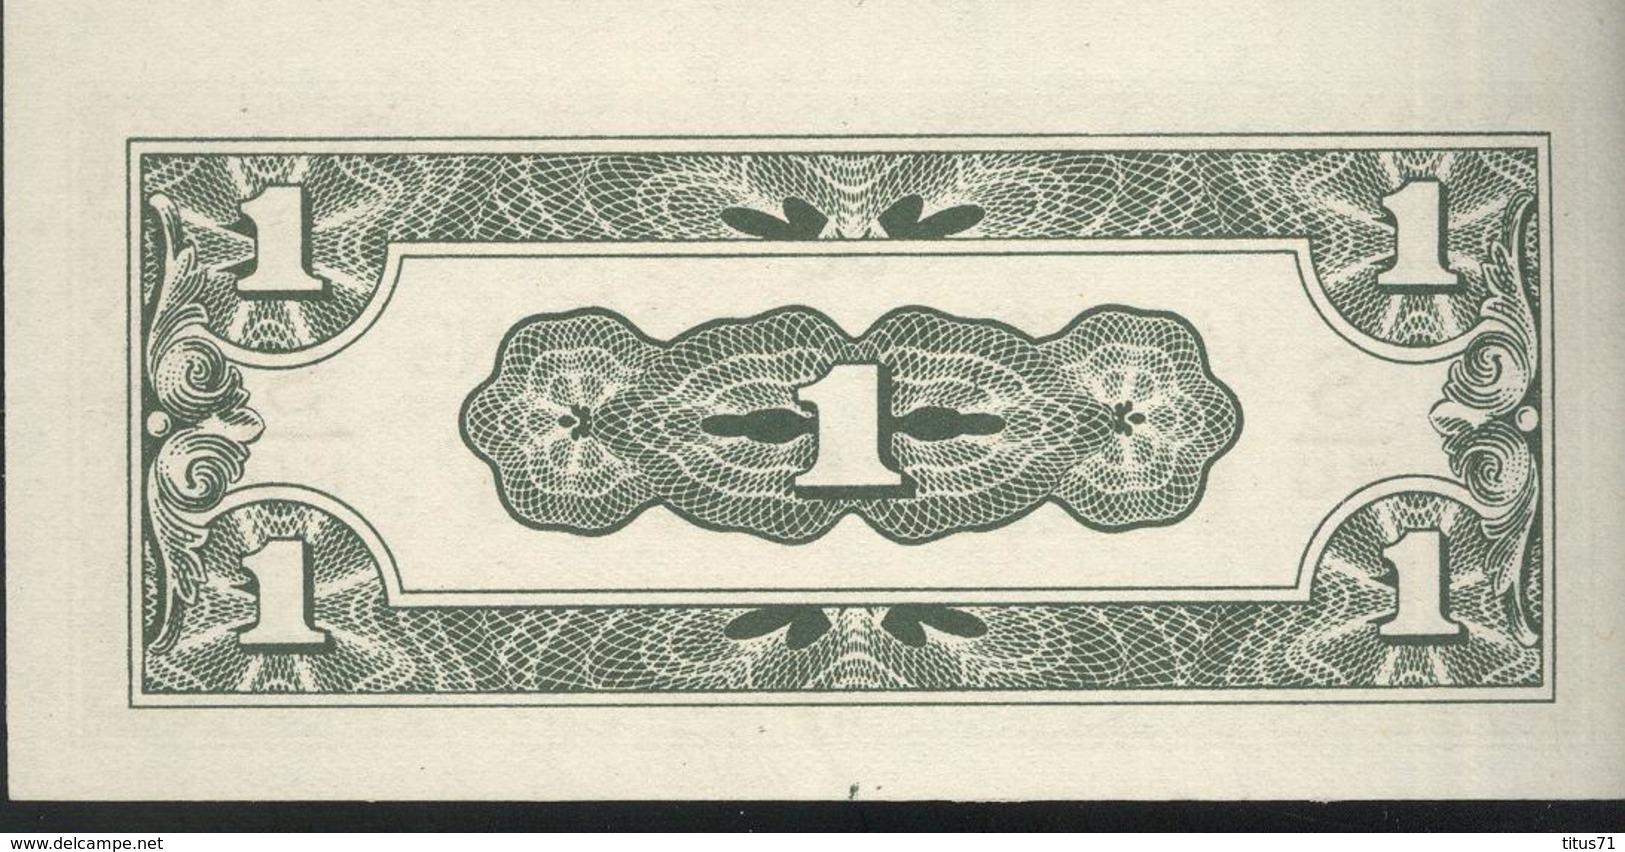 Billet Een Cent Indes Néerlandaises - 1942 Occupation Japonaise SUP - Billets